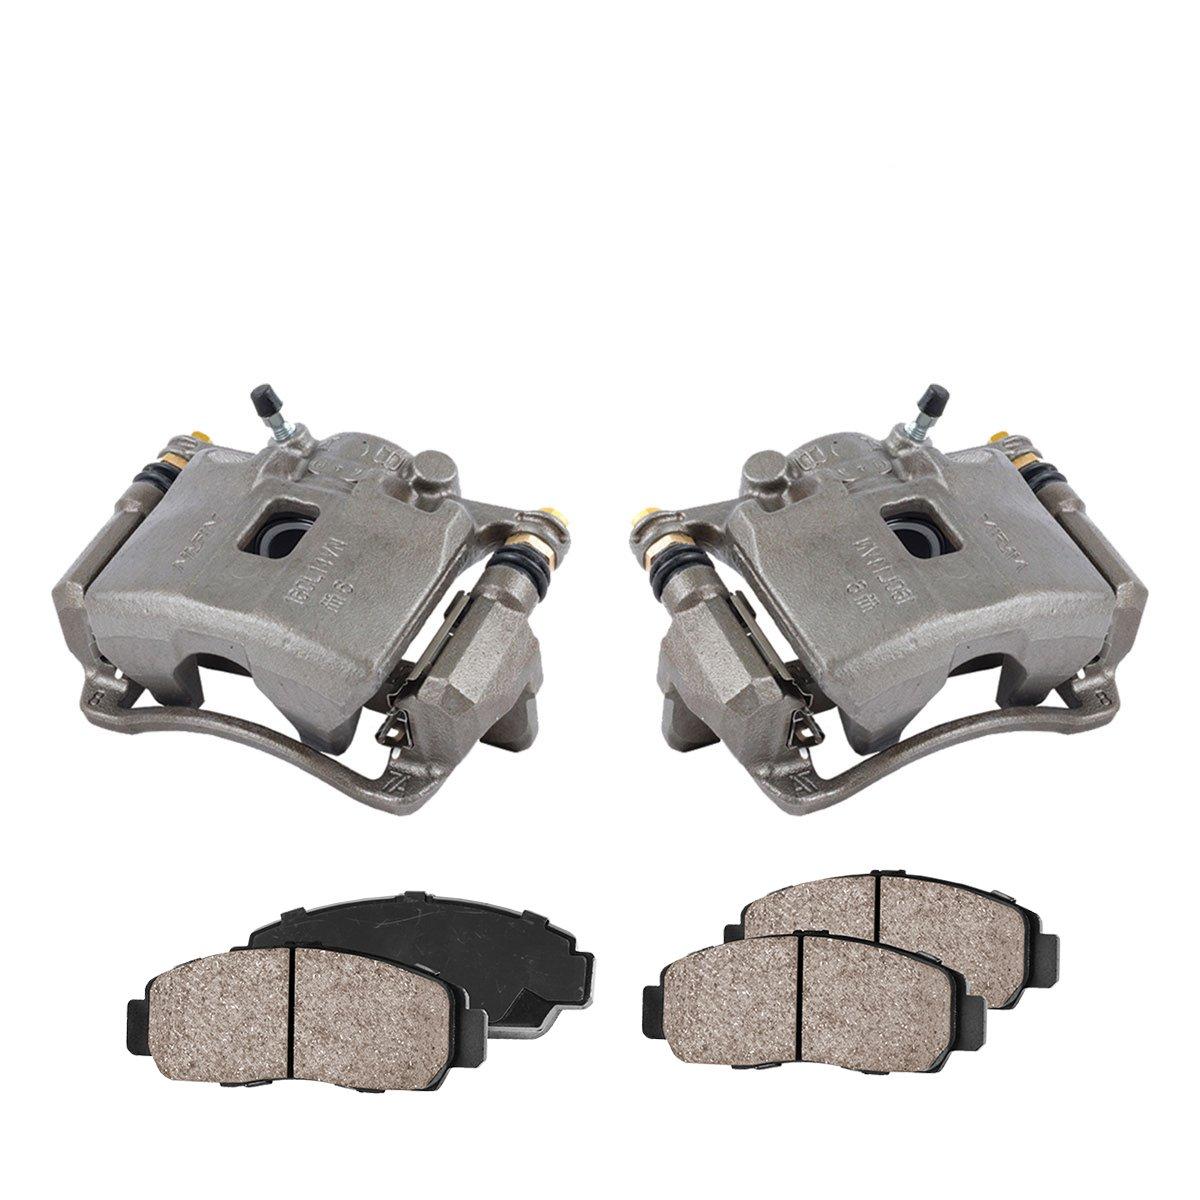 2 CCK11244 Quiet Low Dust Ceramic Brake Pads FRONT Premium Loaded OE Caliper Assembly Set